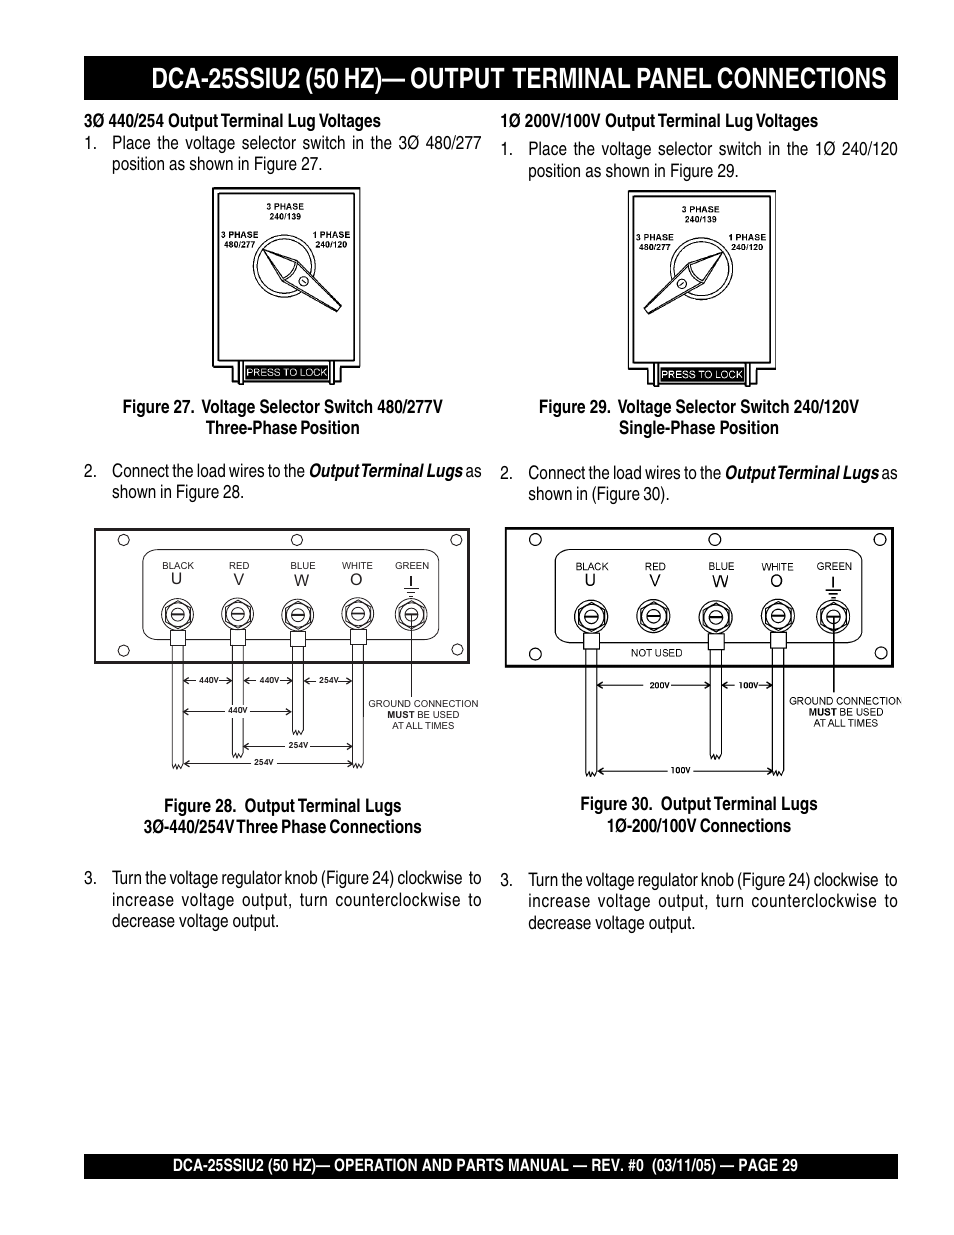 Multiquip Mq Power Whisperwatt 50 Hz Generator Dca 25ssiu2 User 100v 1 Phase Wiring Diagram Manual Page 29 82 Also For Dca25ssiu2